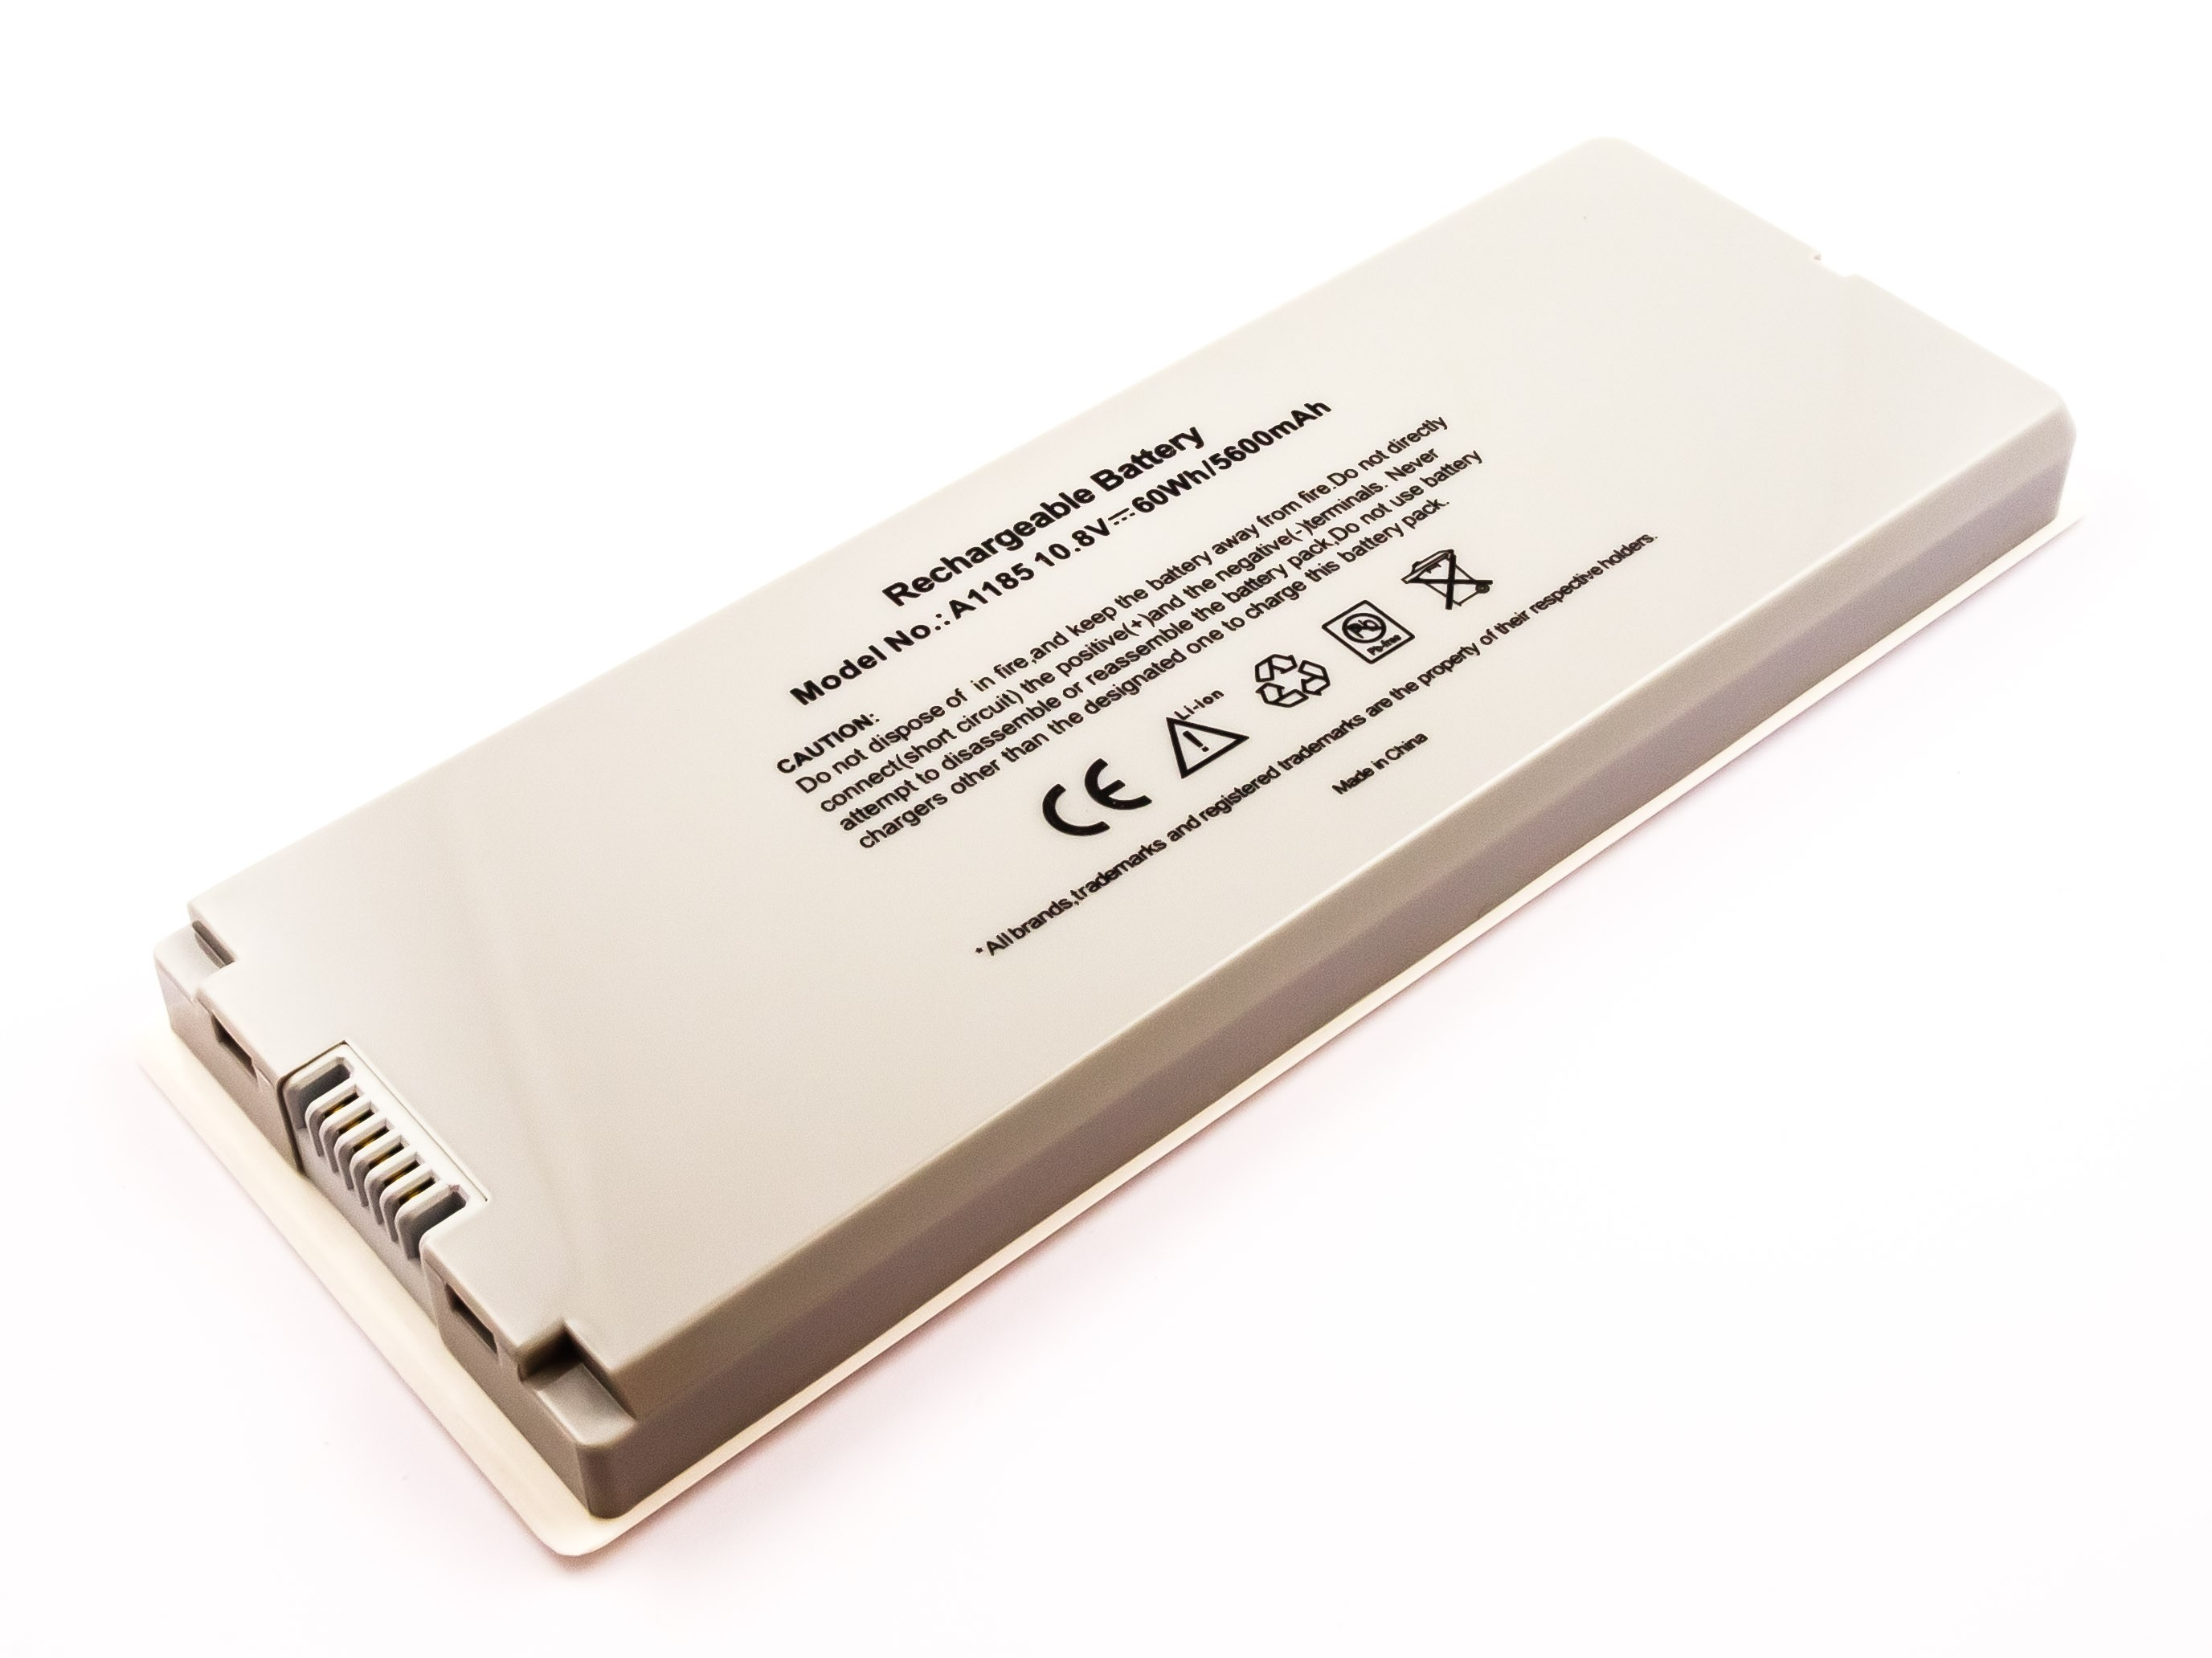 Bateria p/ Portátil Compatível Apple 5600mAh MACBOOK 13 A1185 MA561